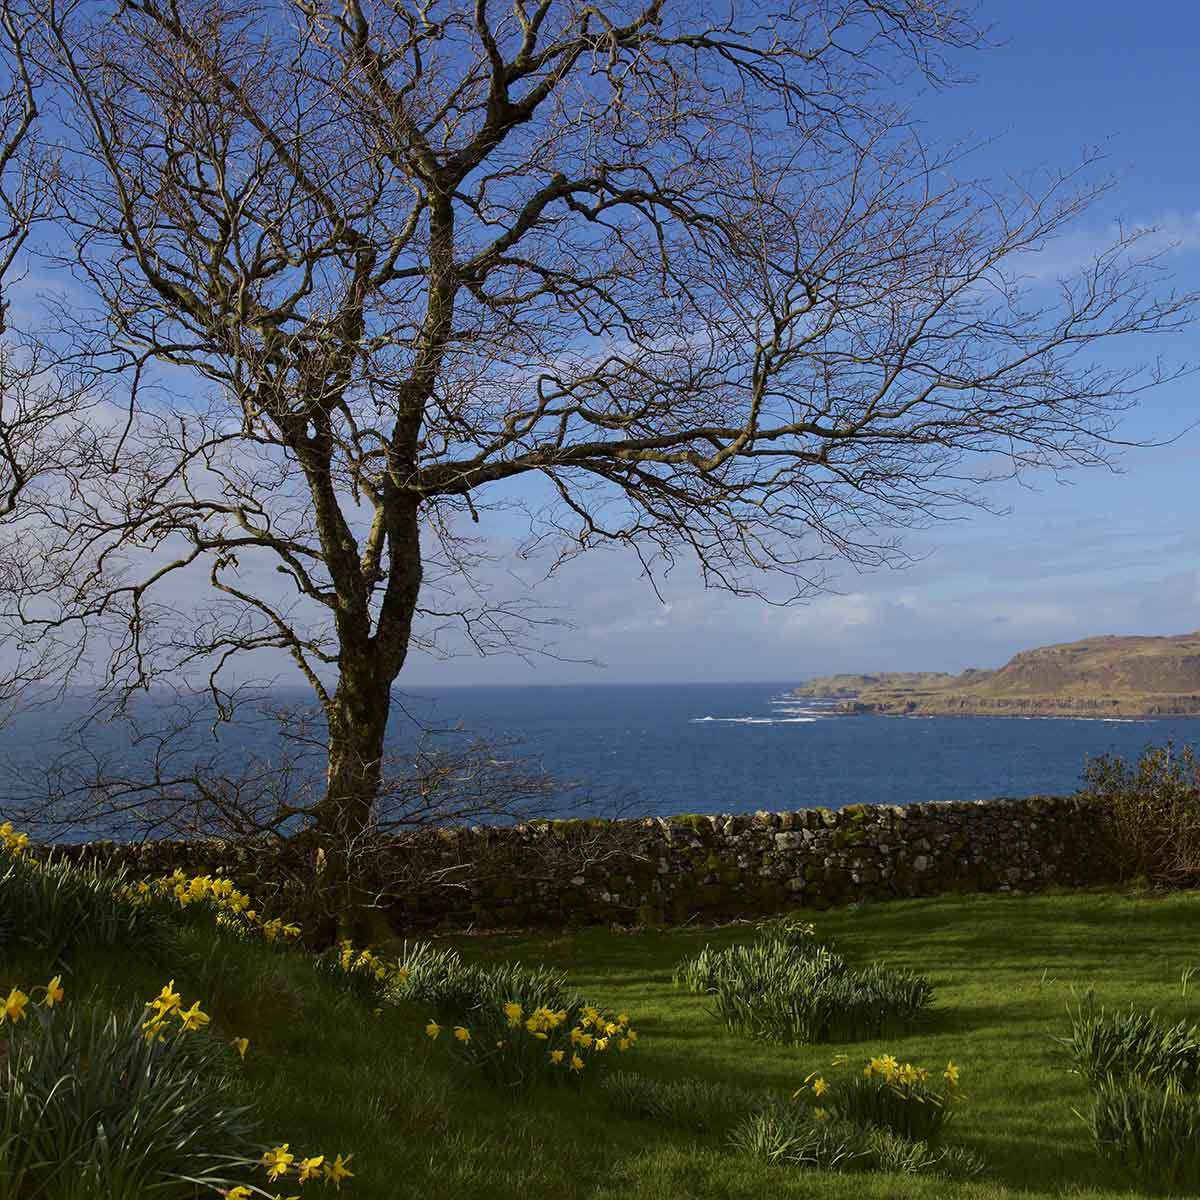 Treshnish, Mull, self-catering, daffodils in March